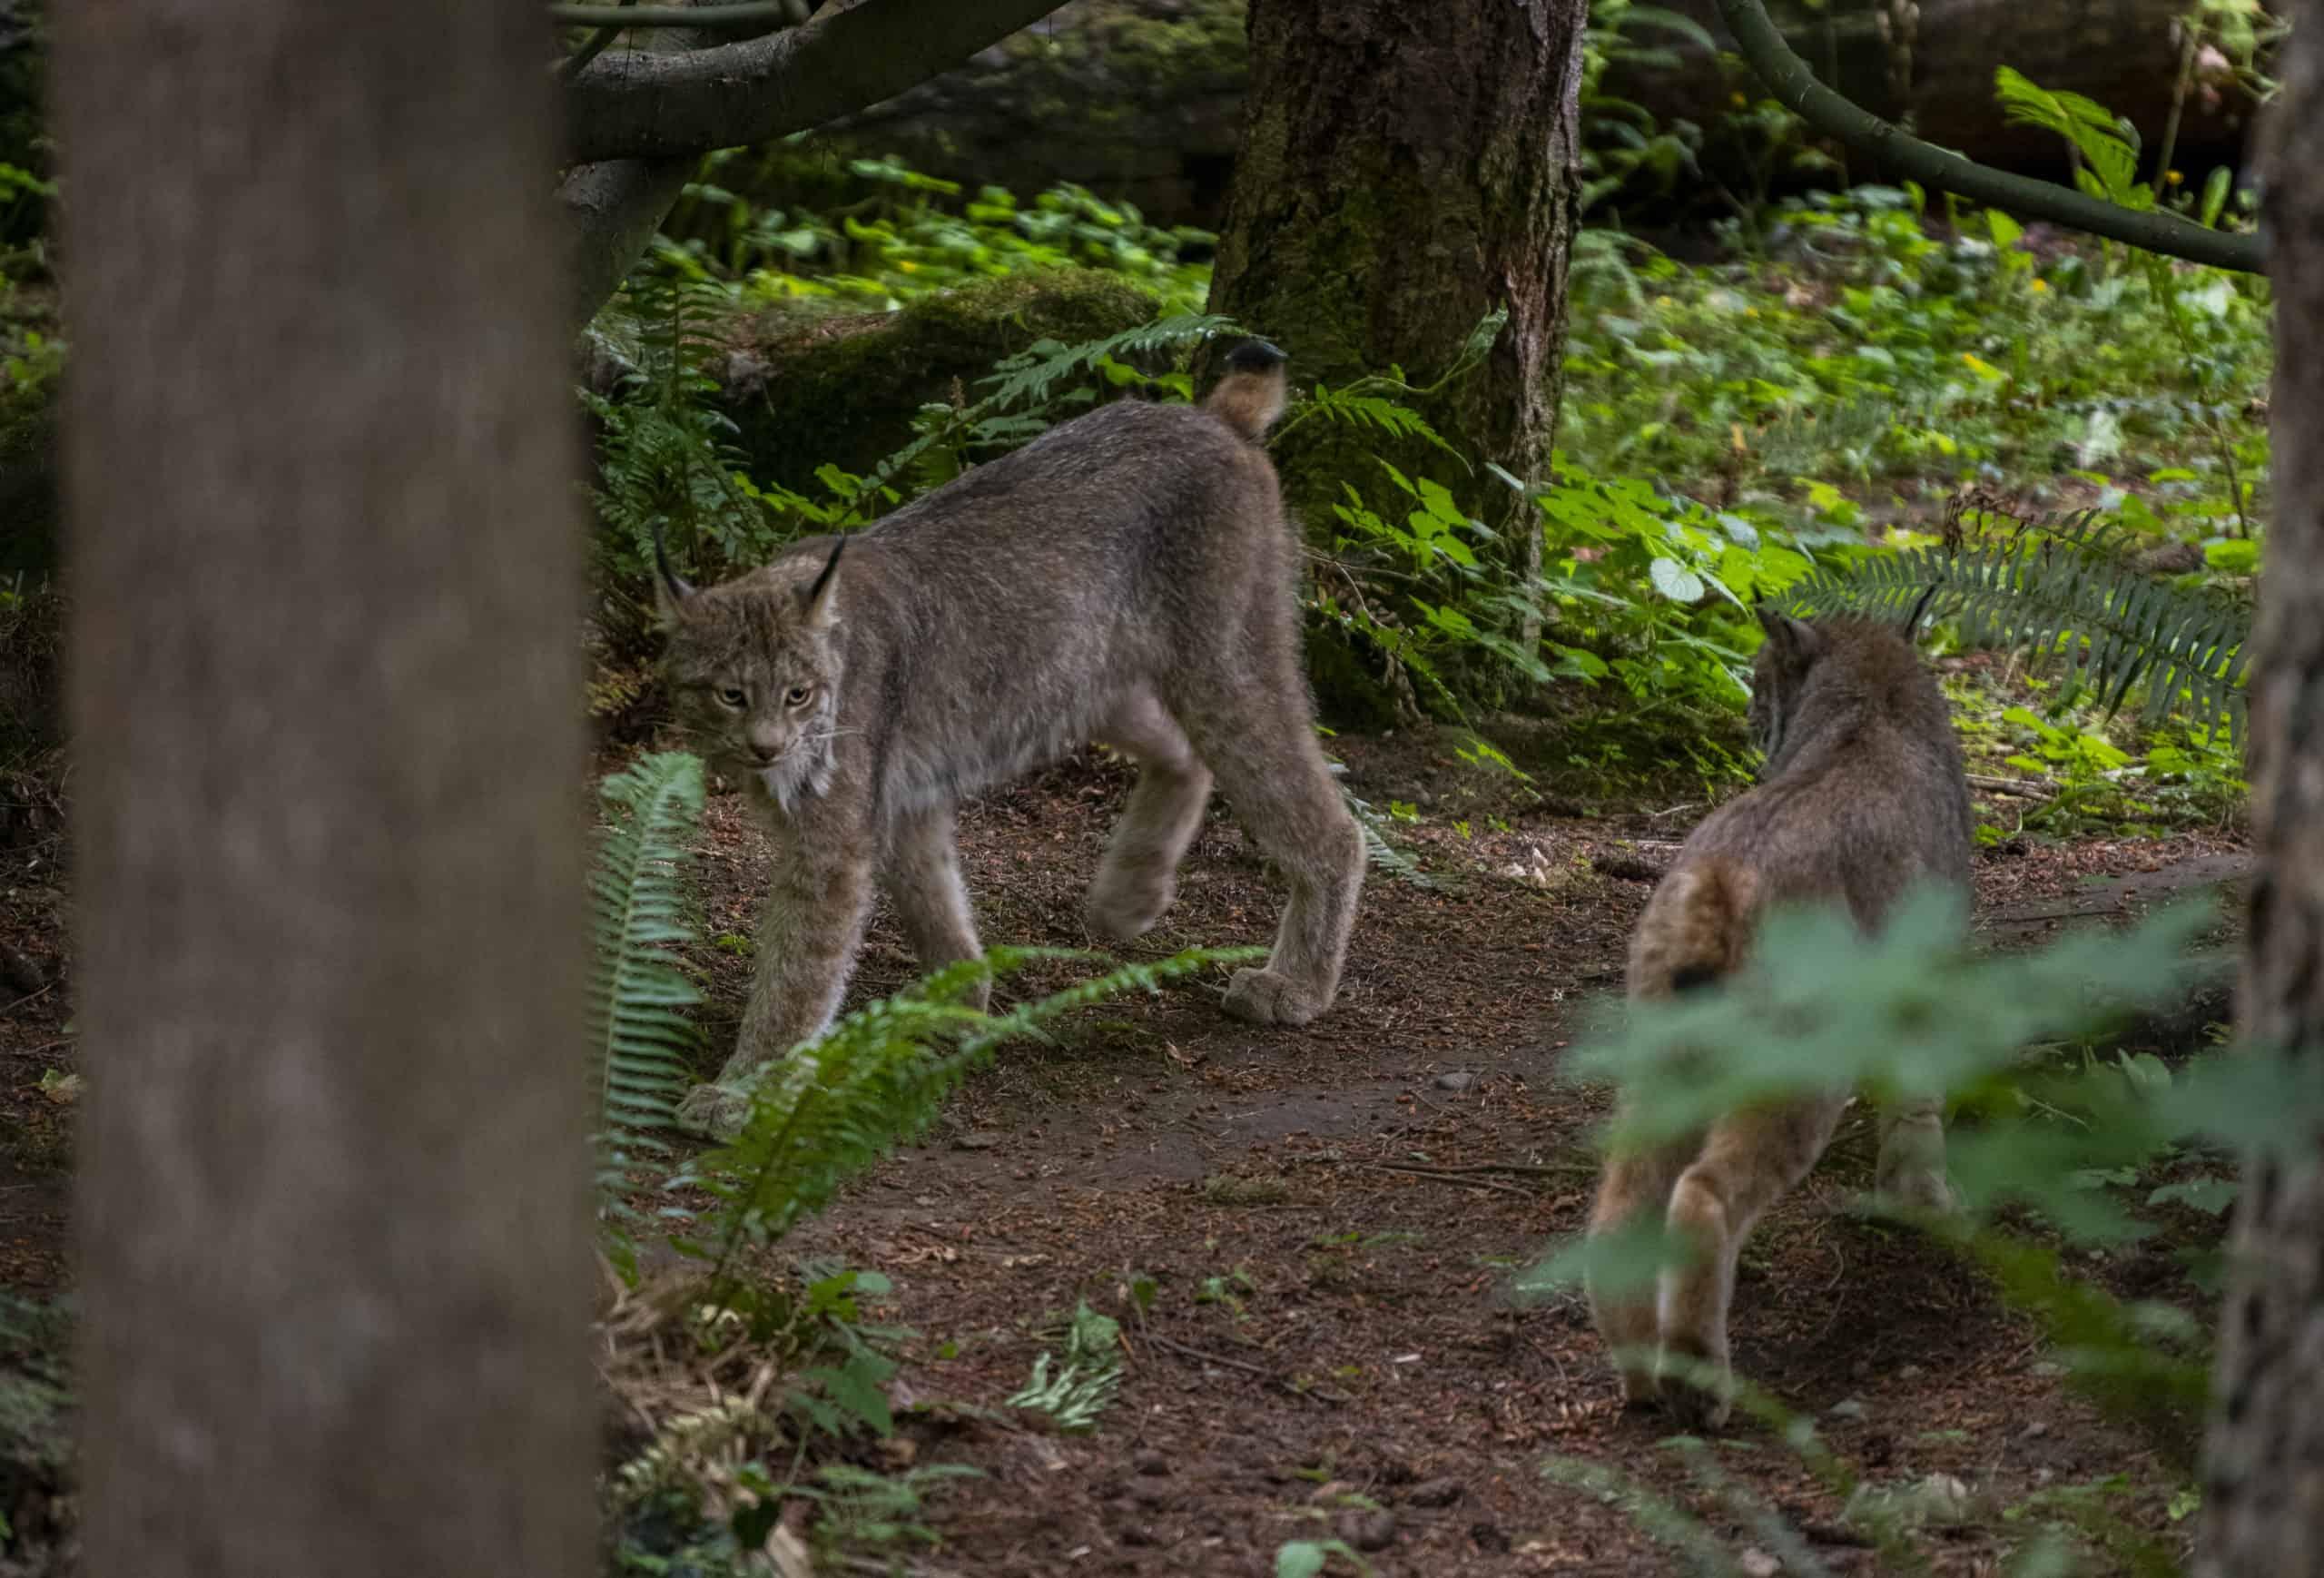 Lynx on Exhibit at Northwest Trek